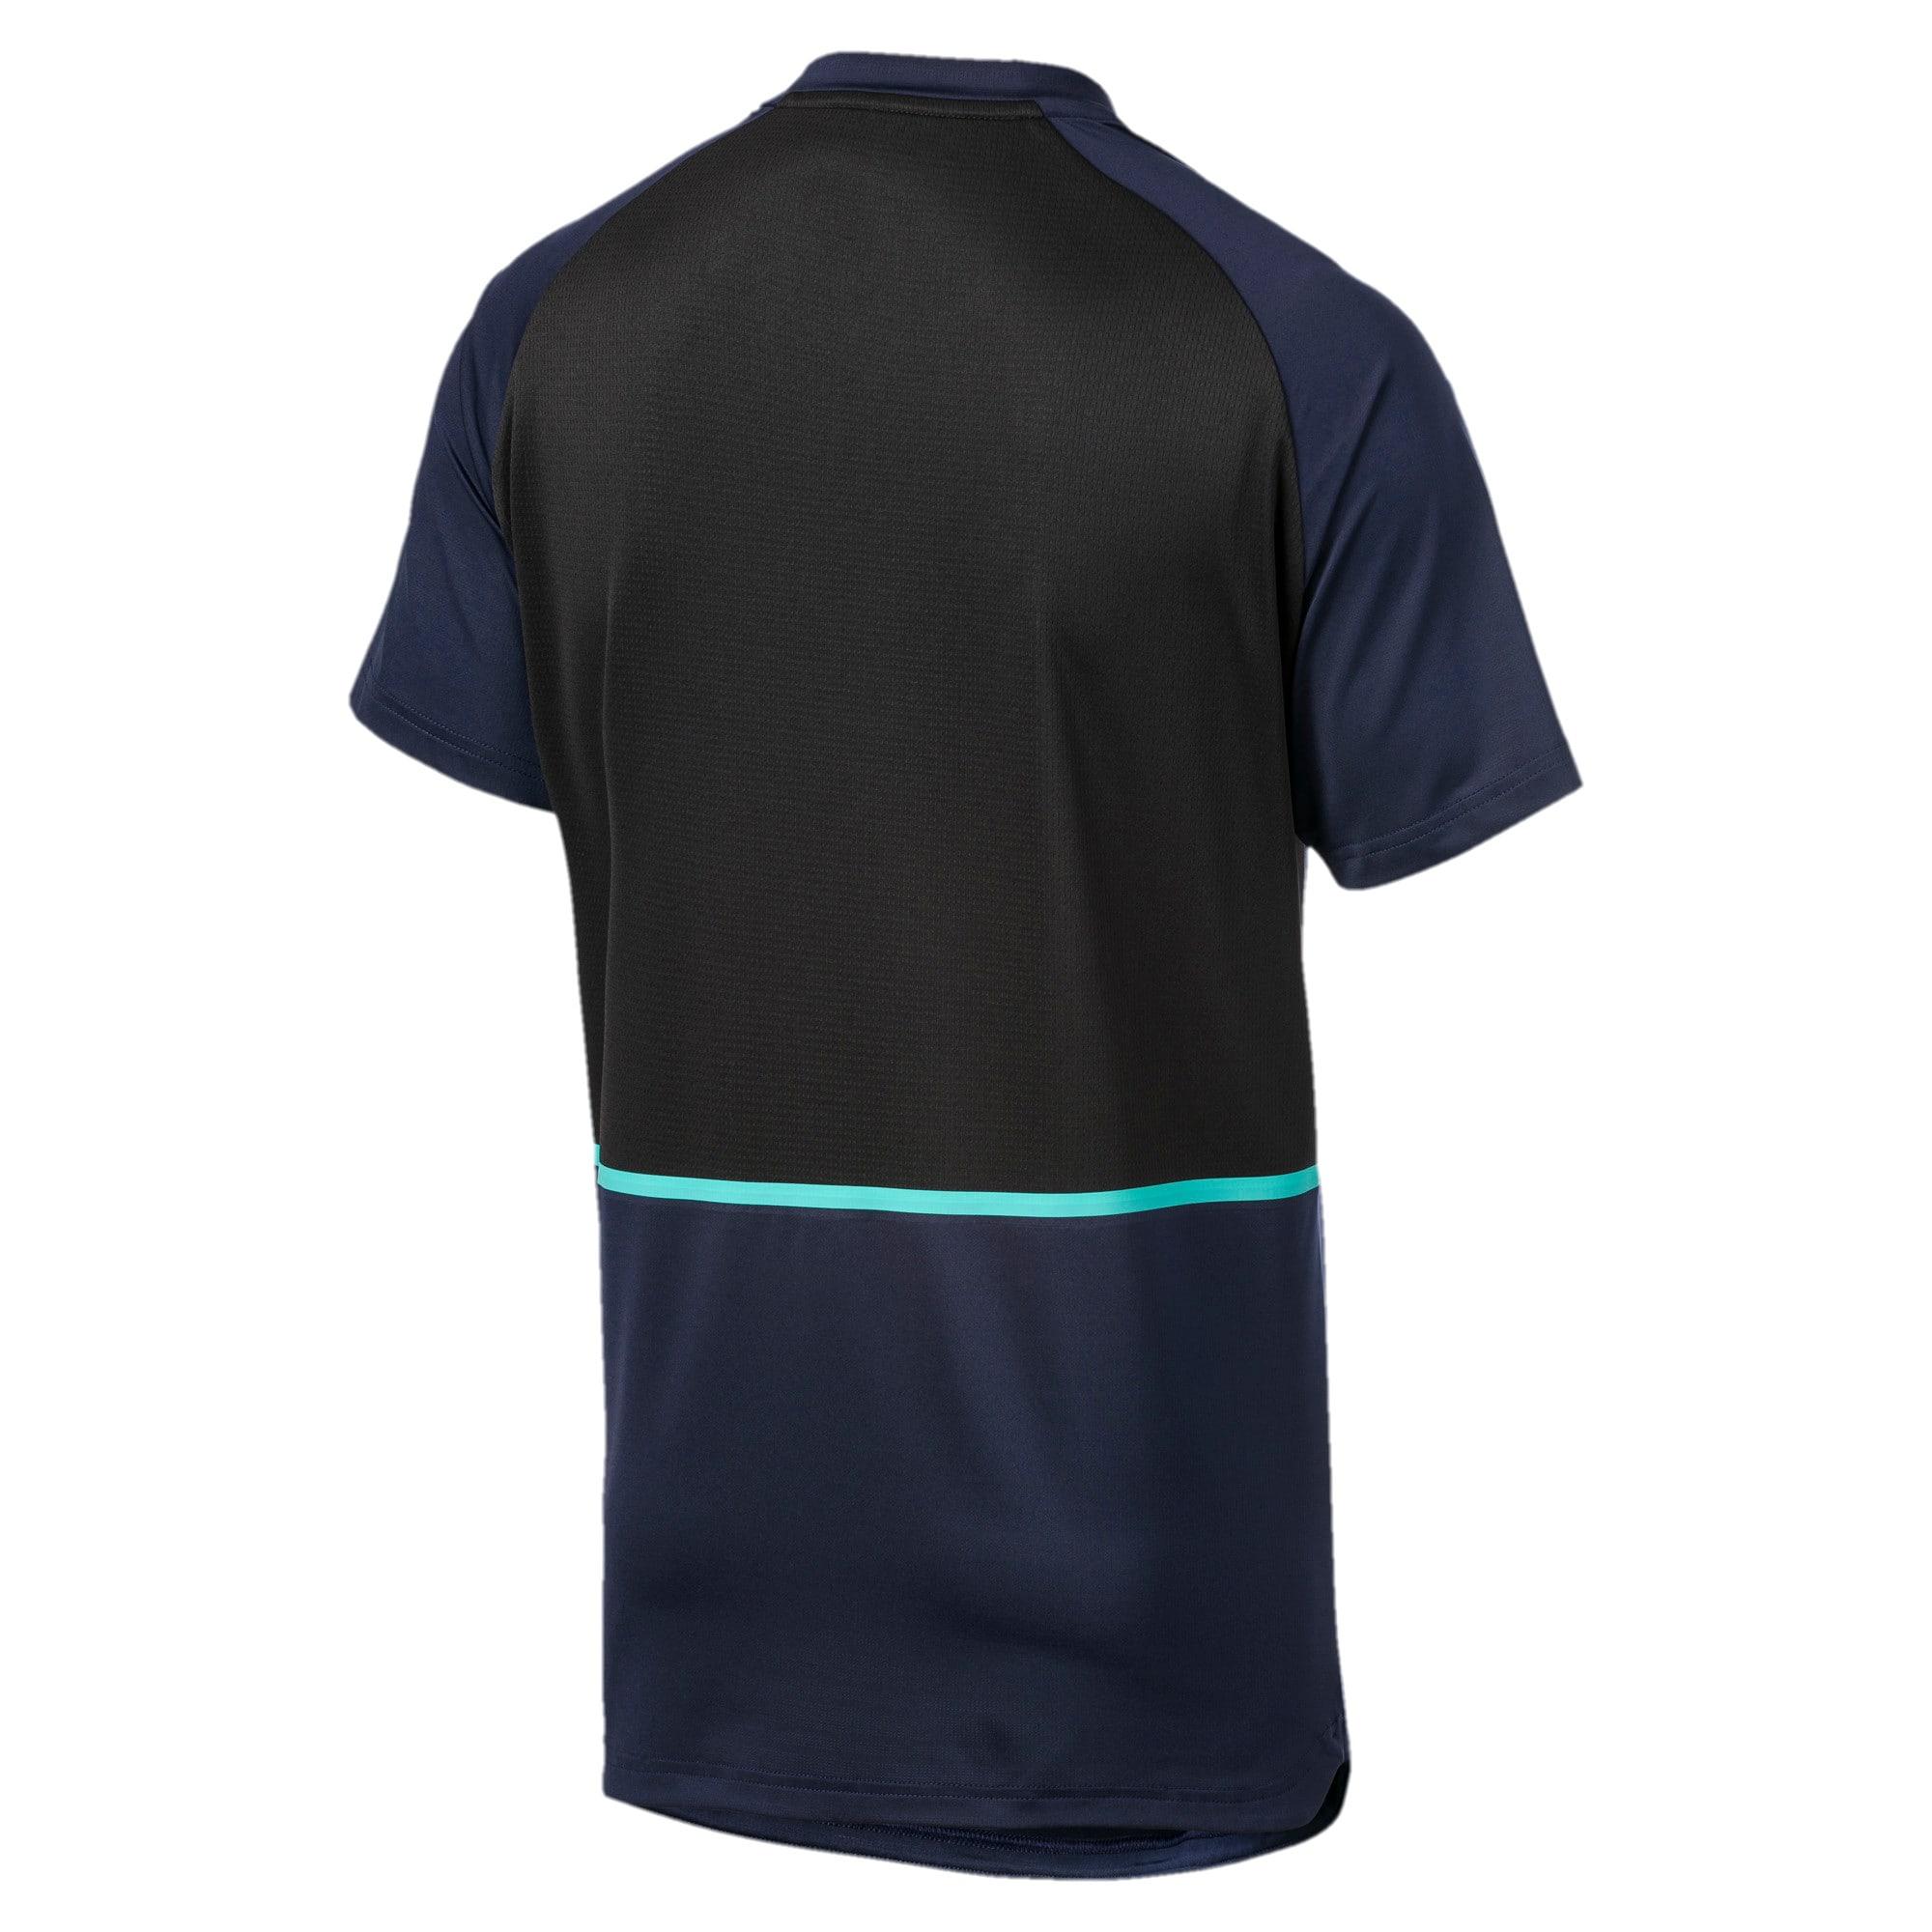 Thumbnail 5 of Power BND T-shirt voor heren, Peacoat-Puma Black, medium